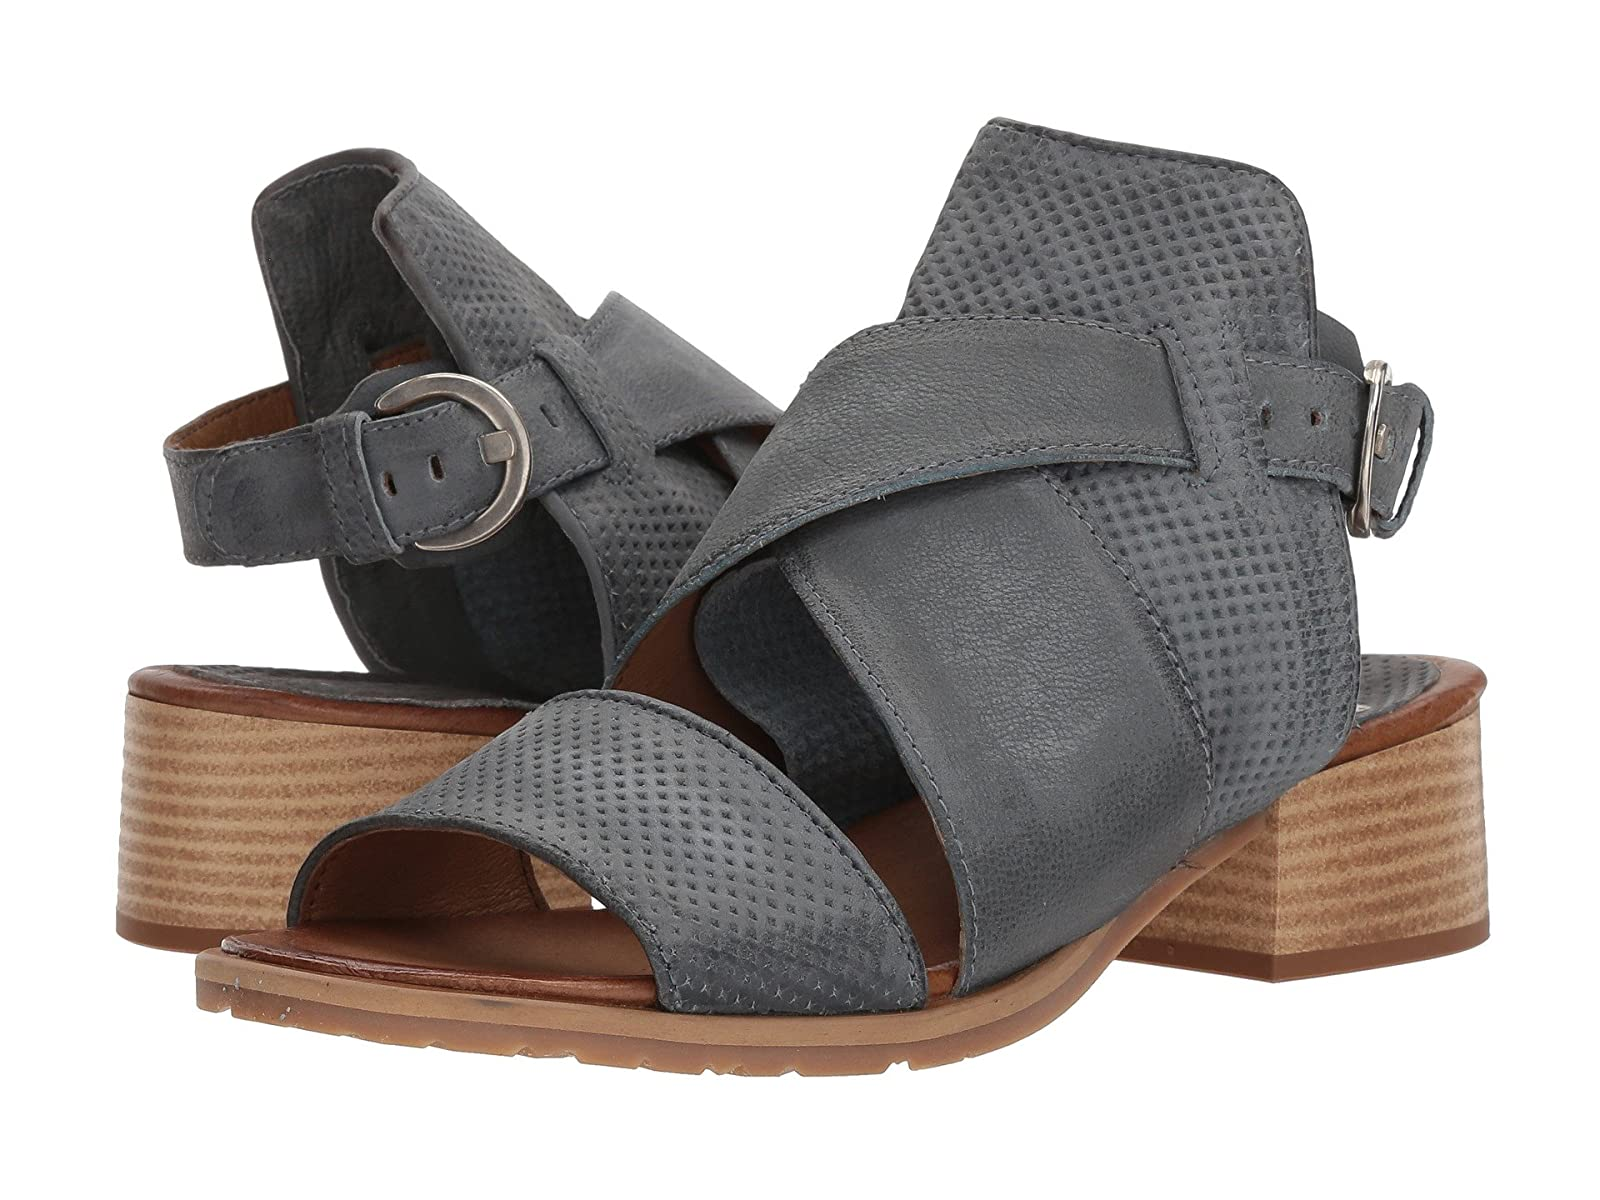 Miz Mooz FijiCheap and distinctive eye-catching shoes